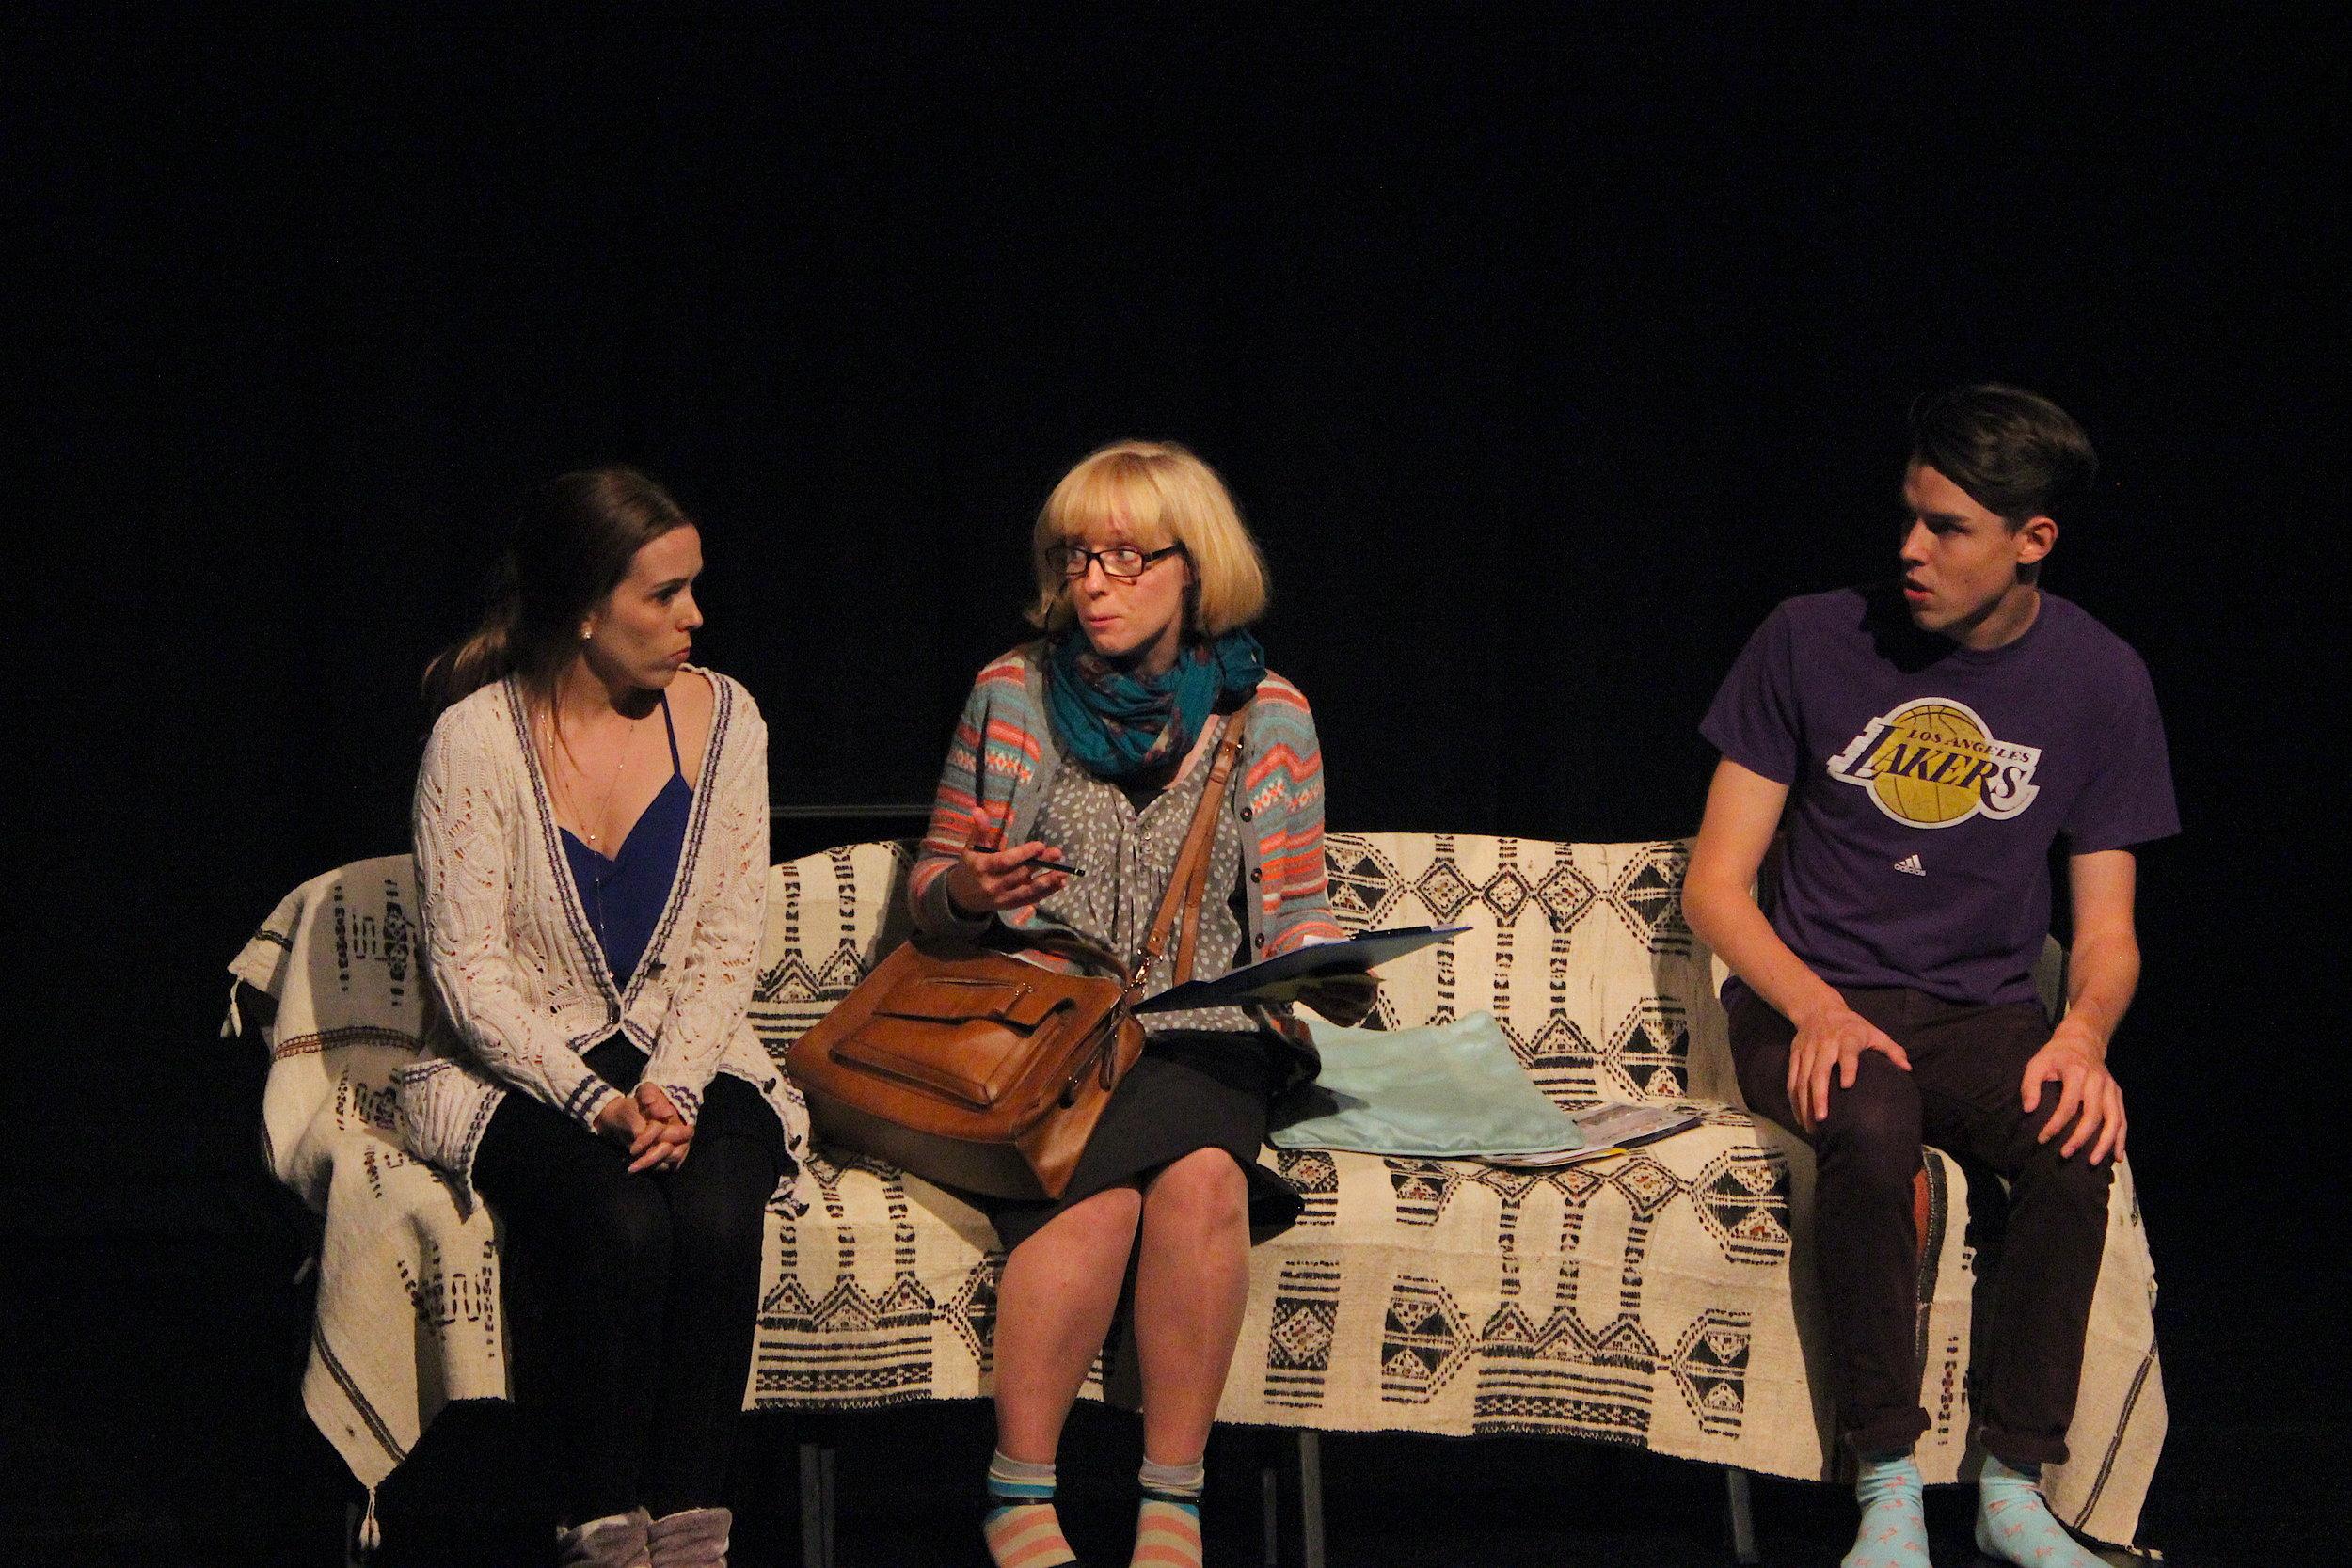 'Singles Night' play by Mark Ralph-Bowman